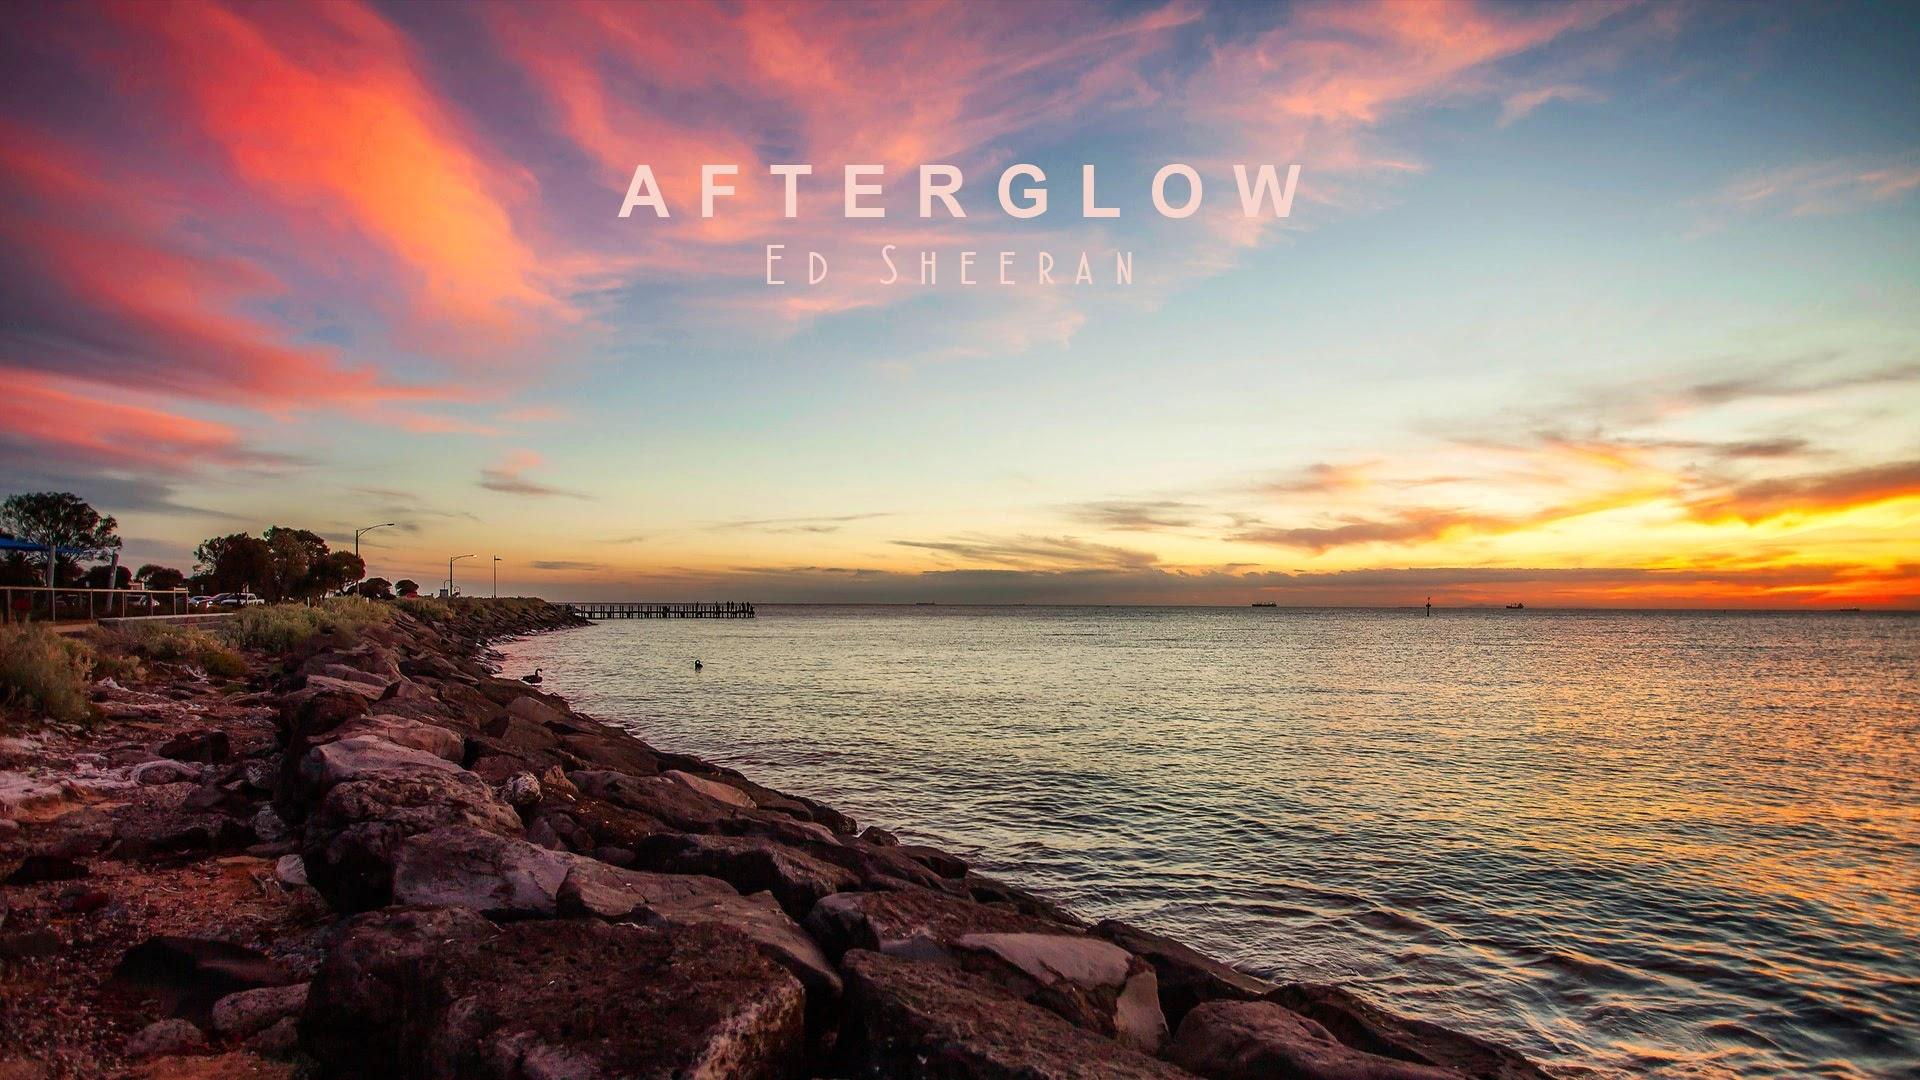 Afterglow - Ed Sheeran